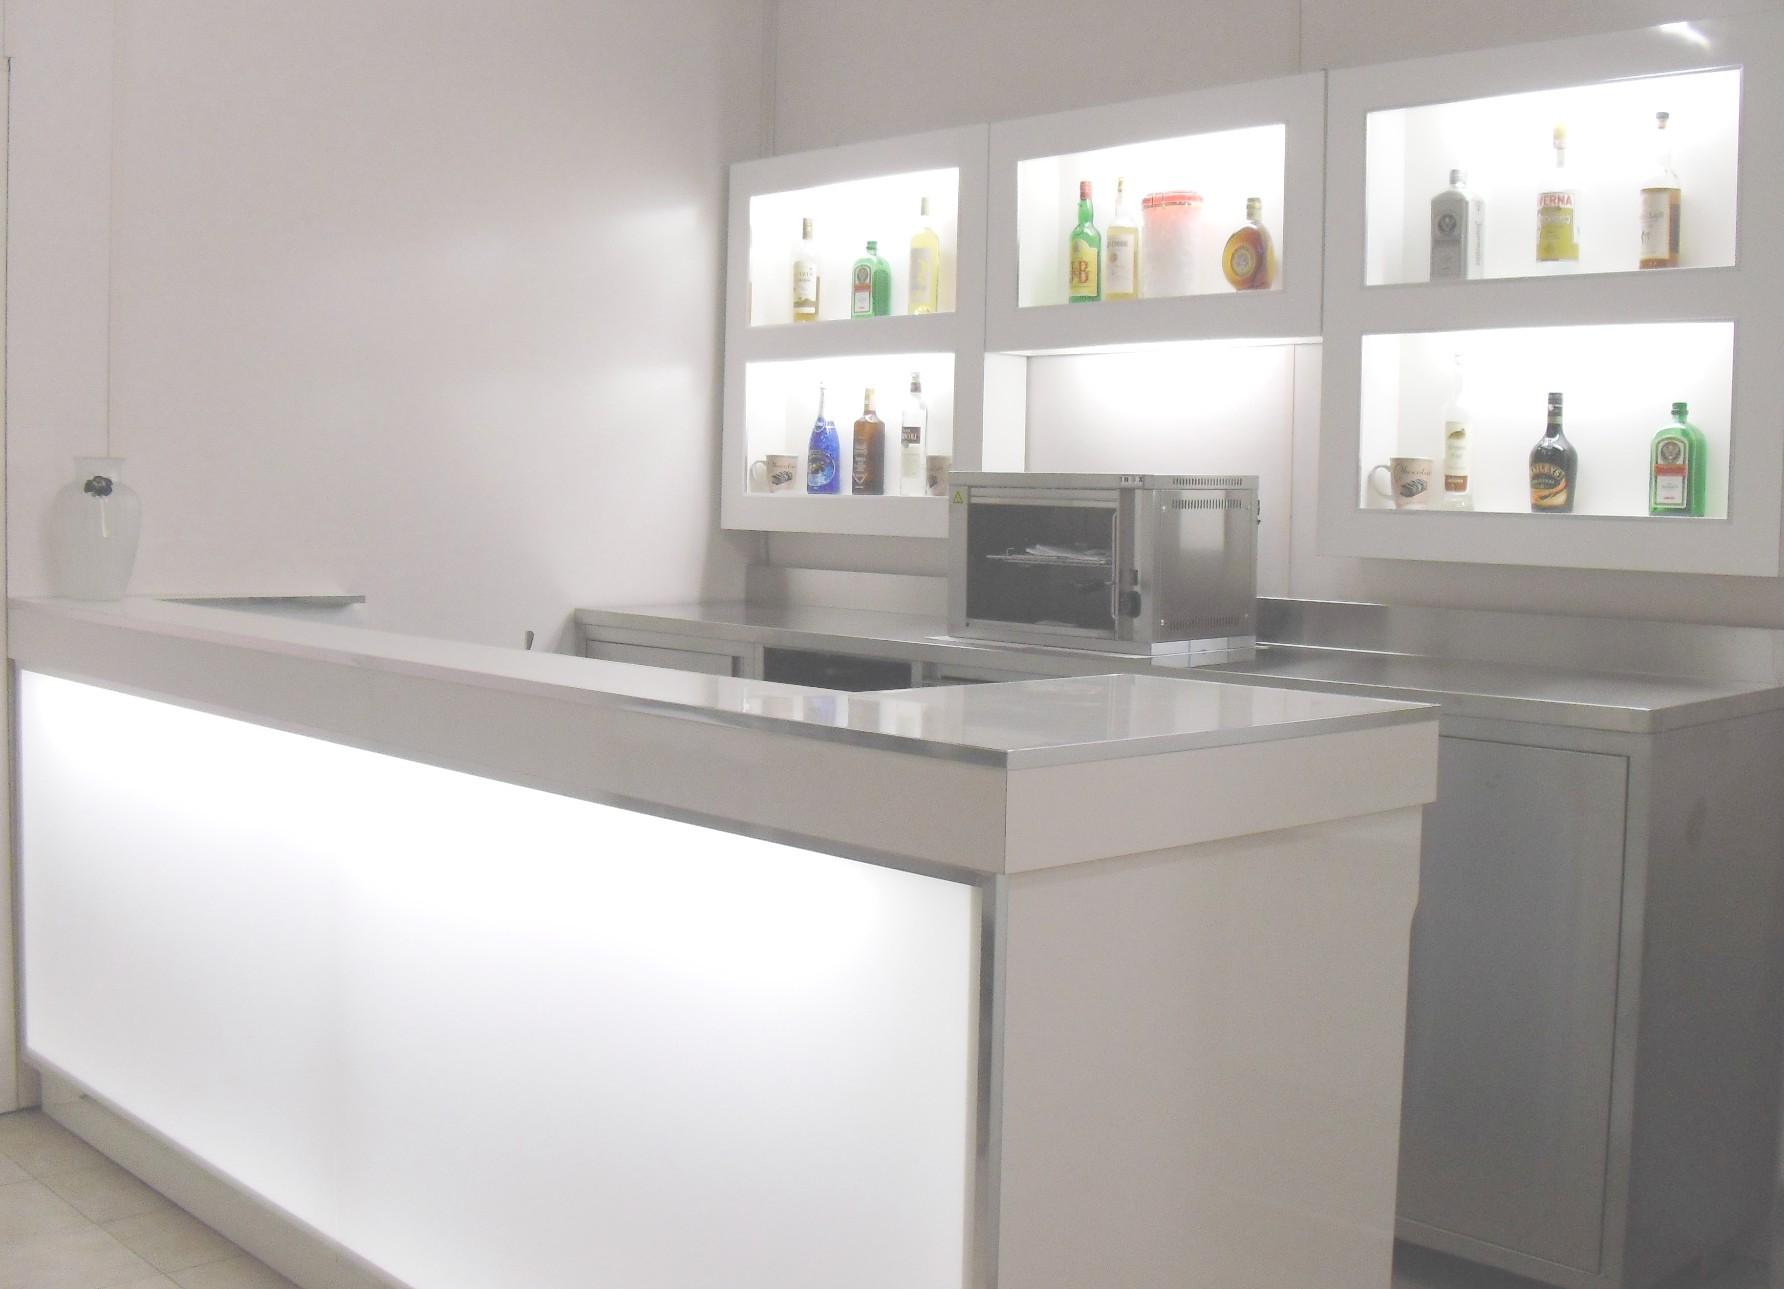 Banchi frigo dal 1980 produttori di banchi frigo for Usato bancone bar